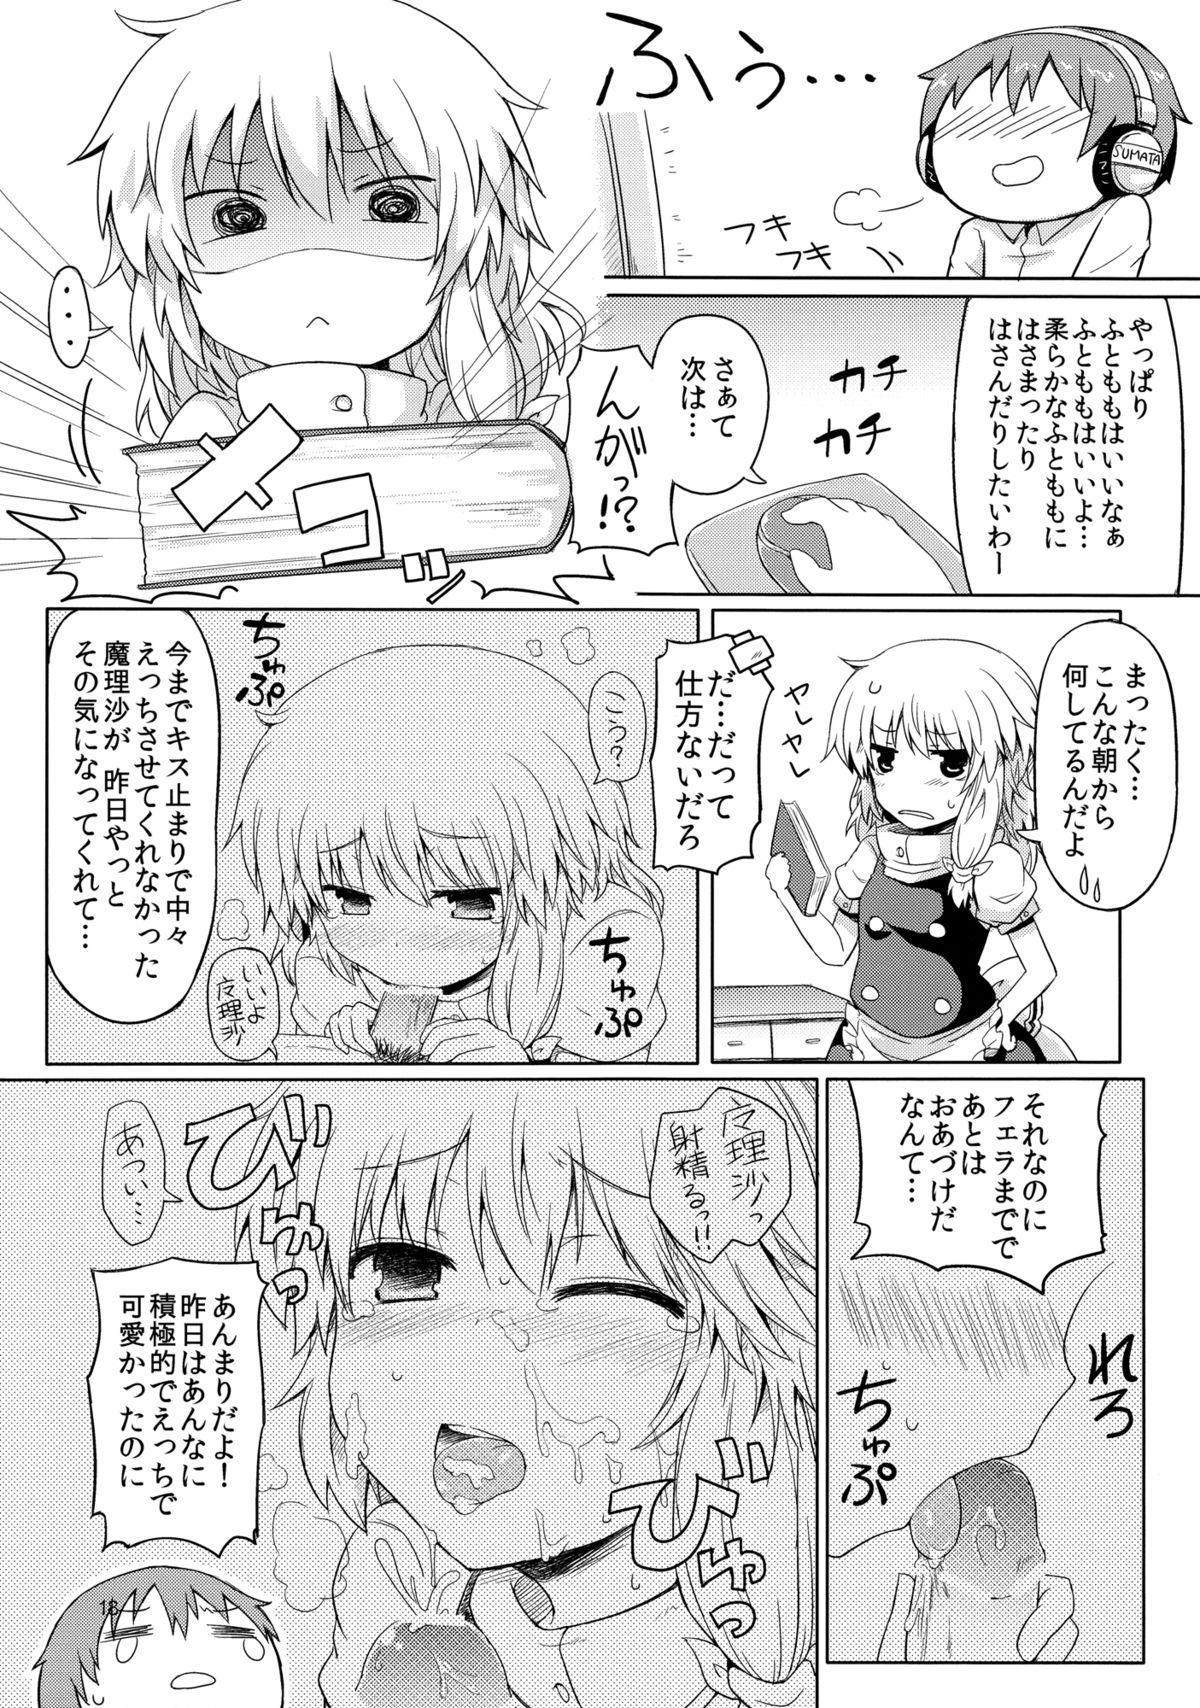 Sumata Goudoushi Omatase 18